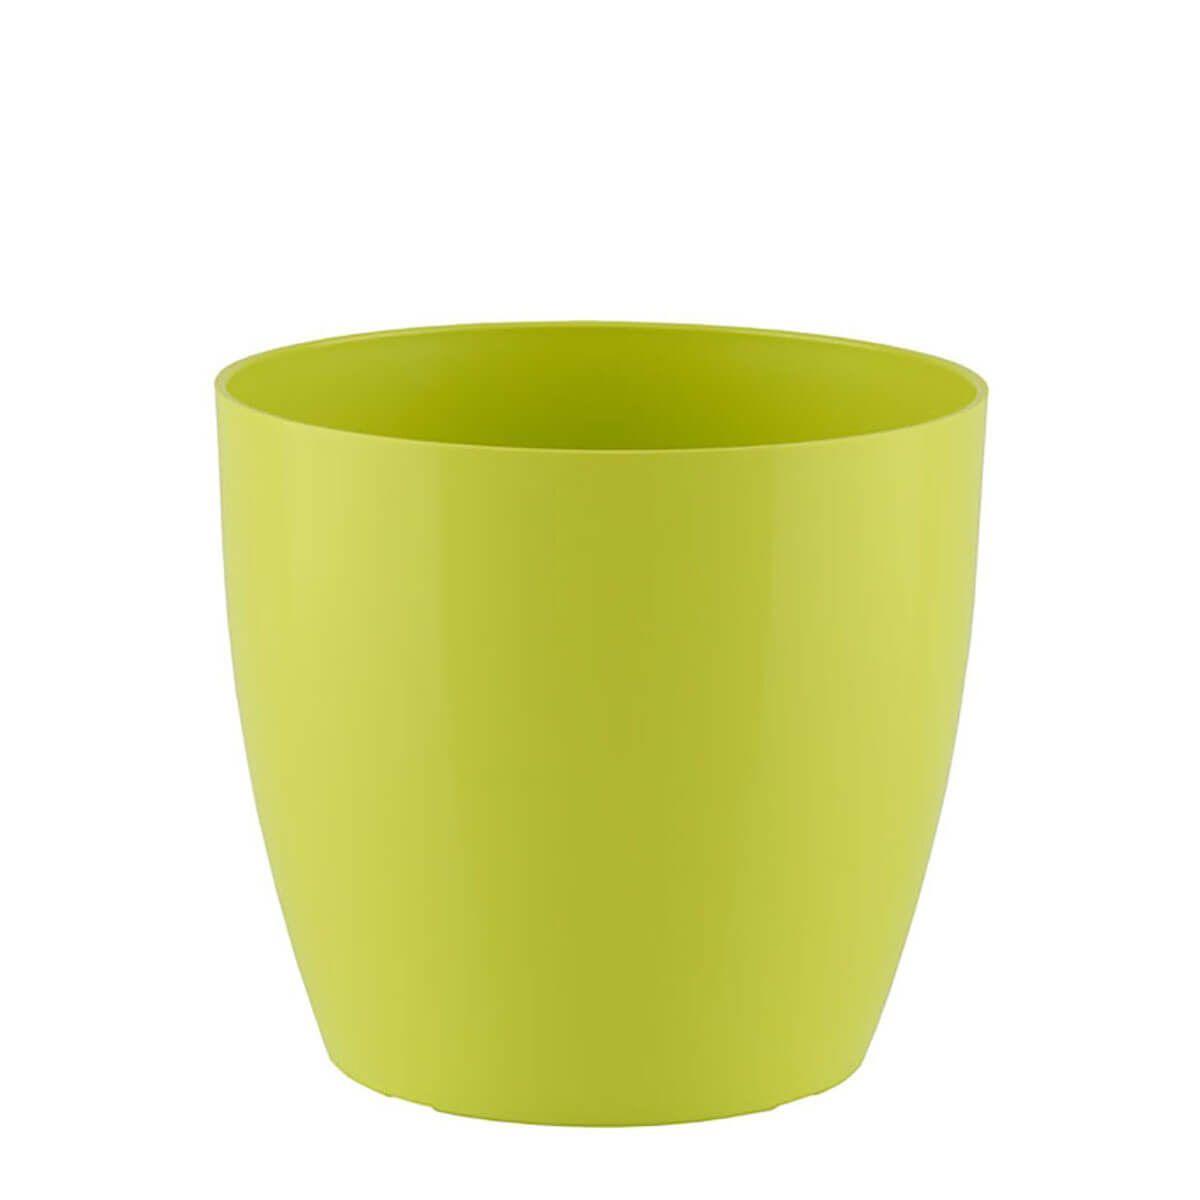 Vaso San Remo 20 x 18 cm Verde